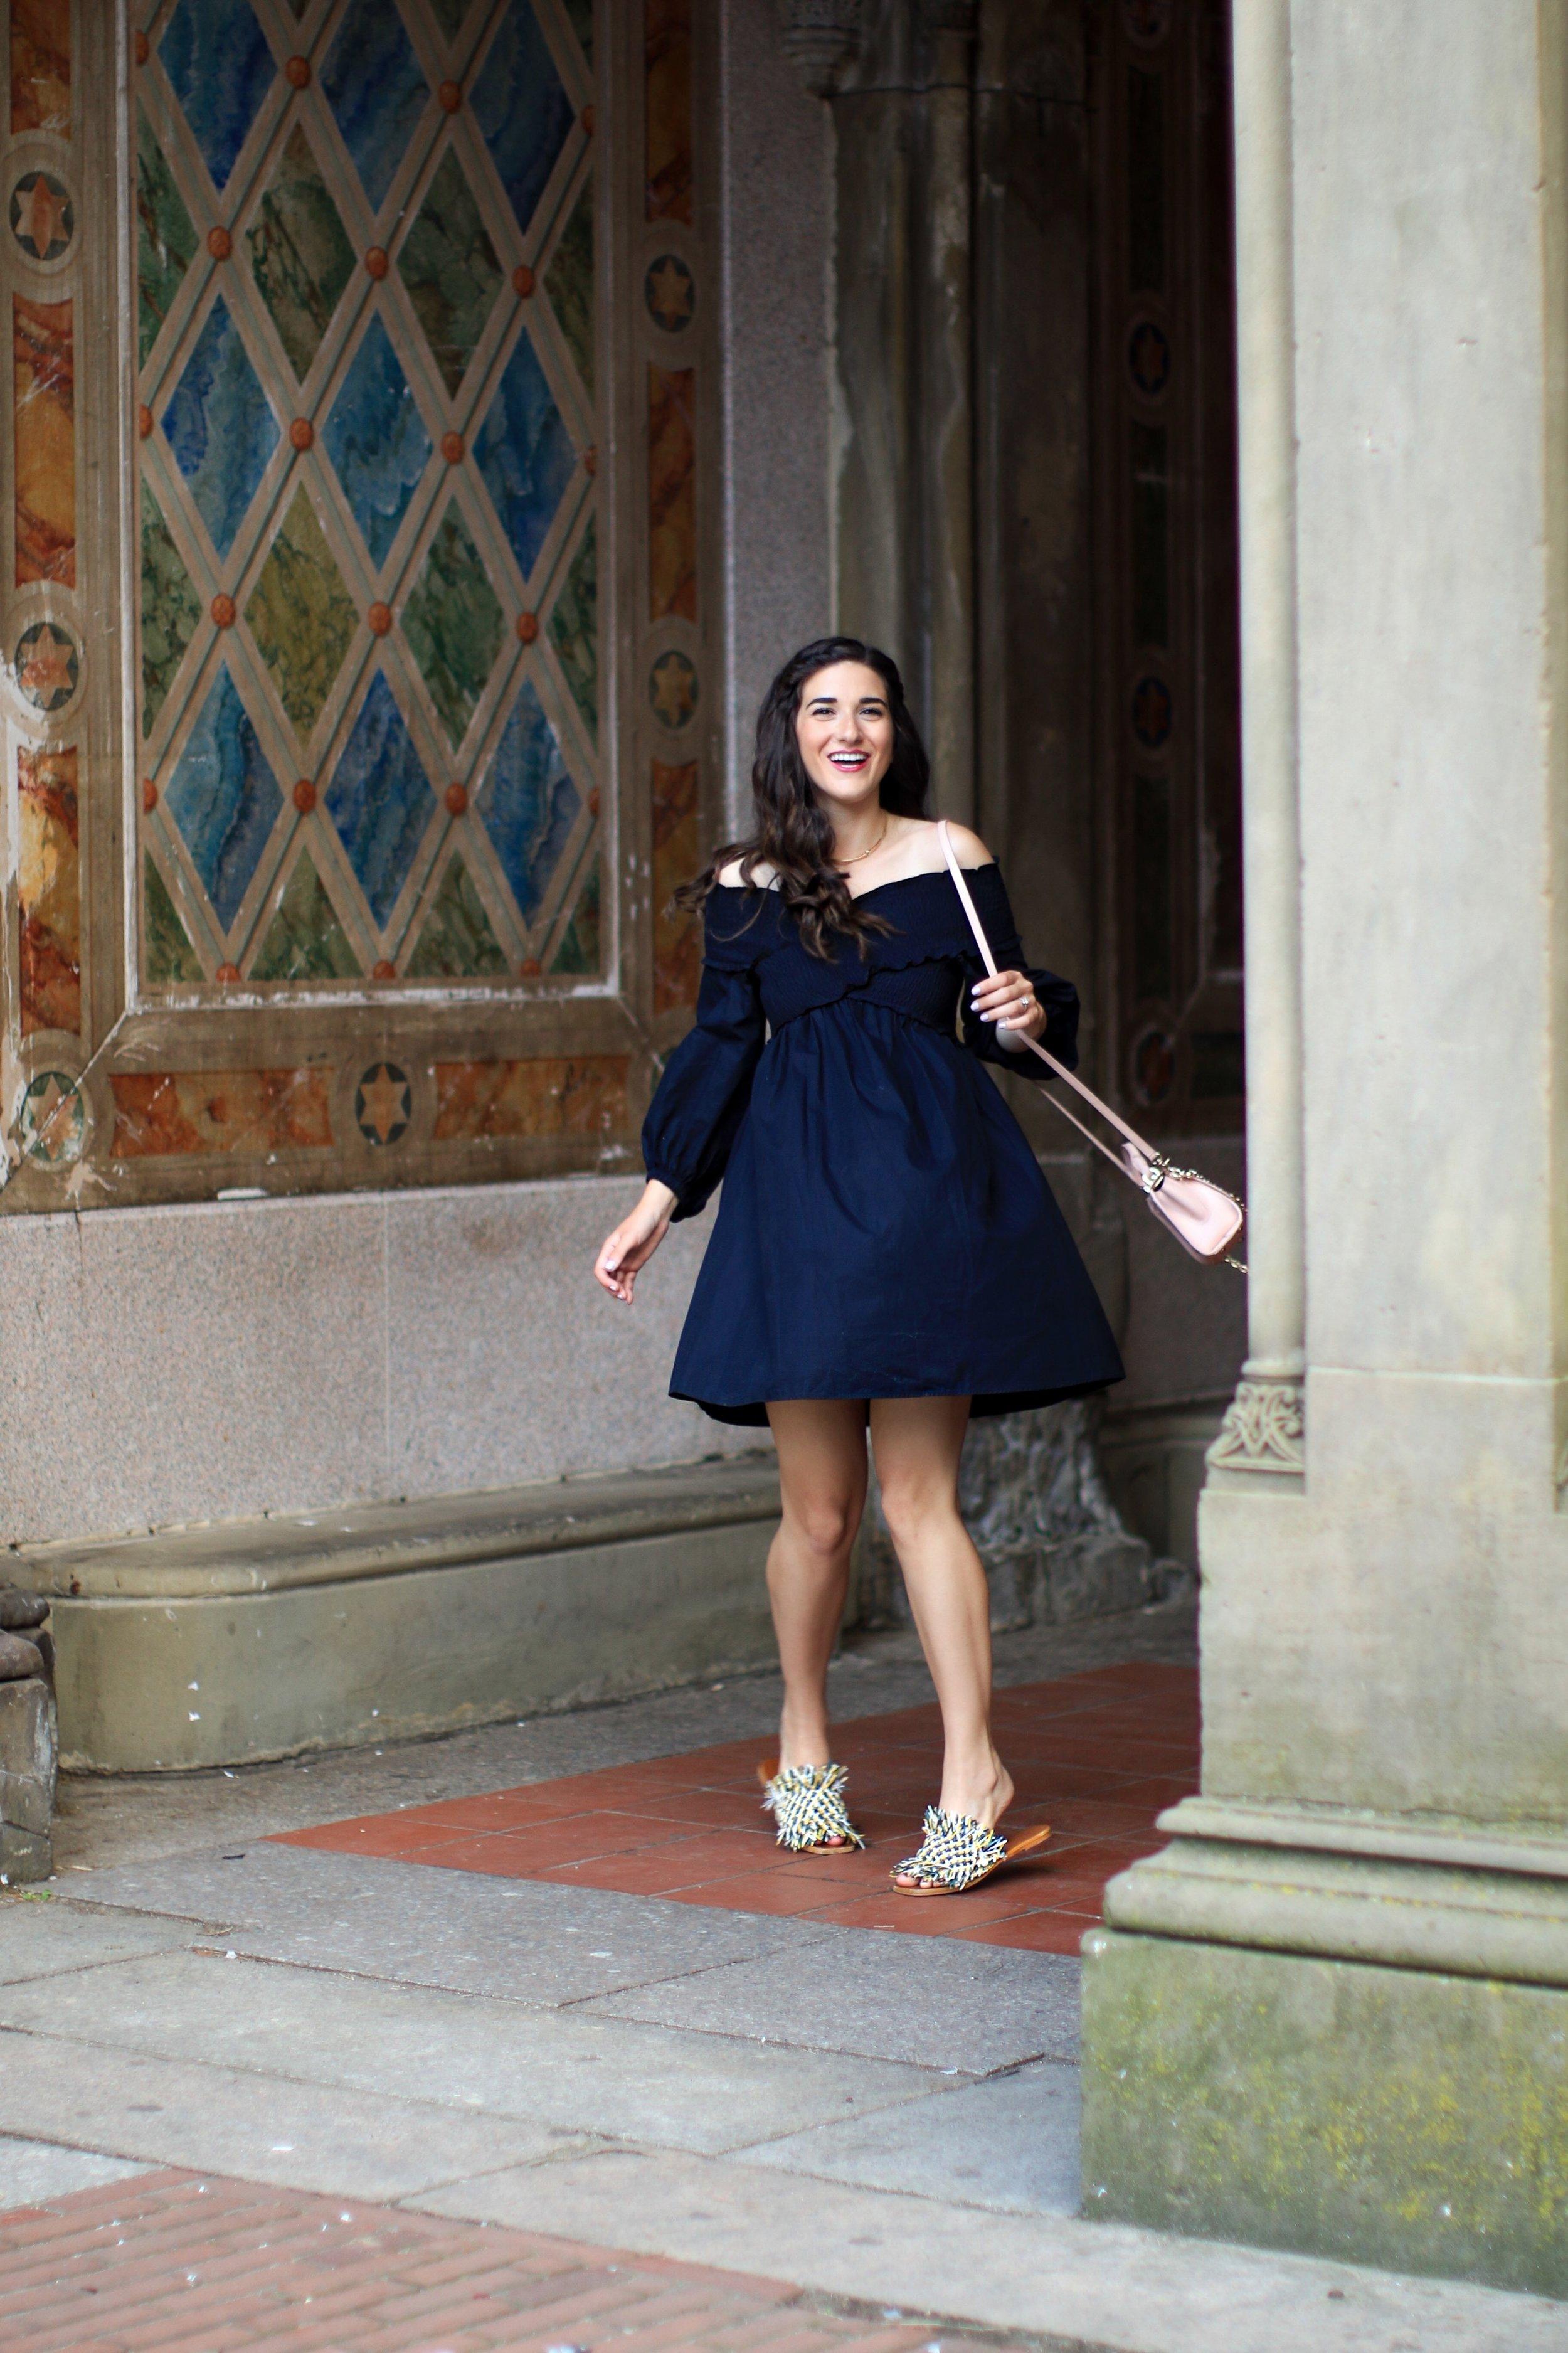 Navy Dress Fringe Slides 27 Blogging Tips For My 27th Birthday Esther Santer Fashion Blog NYC Street Style Blogger Outfit OOTD Trendy Girl Women Pink Bag Zac Posen Purse Summer Sandals What To Wear Inspiration  Inspo Shoes Girly Feminine New York City.JPG